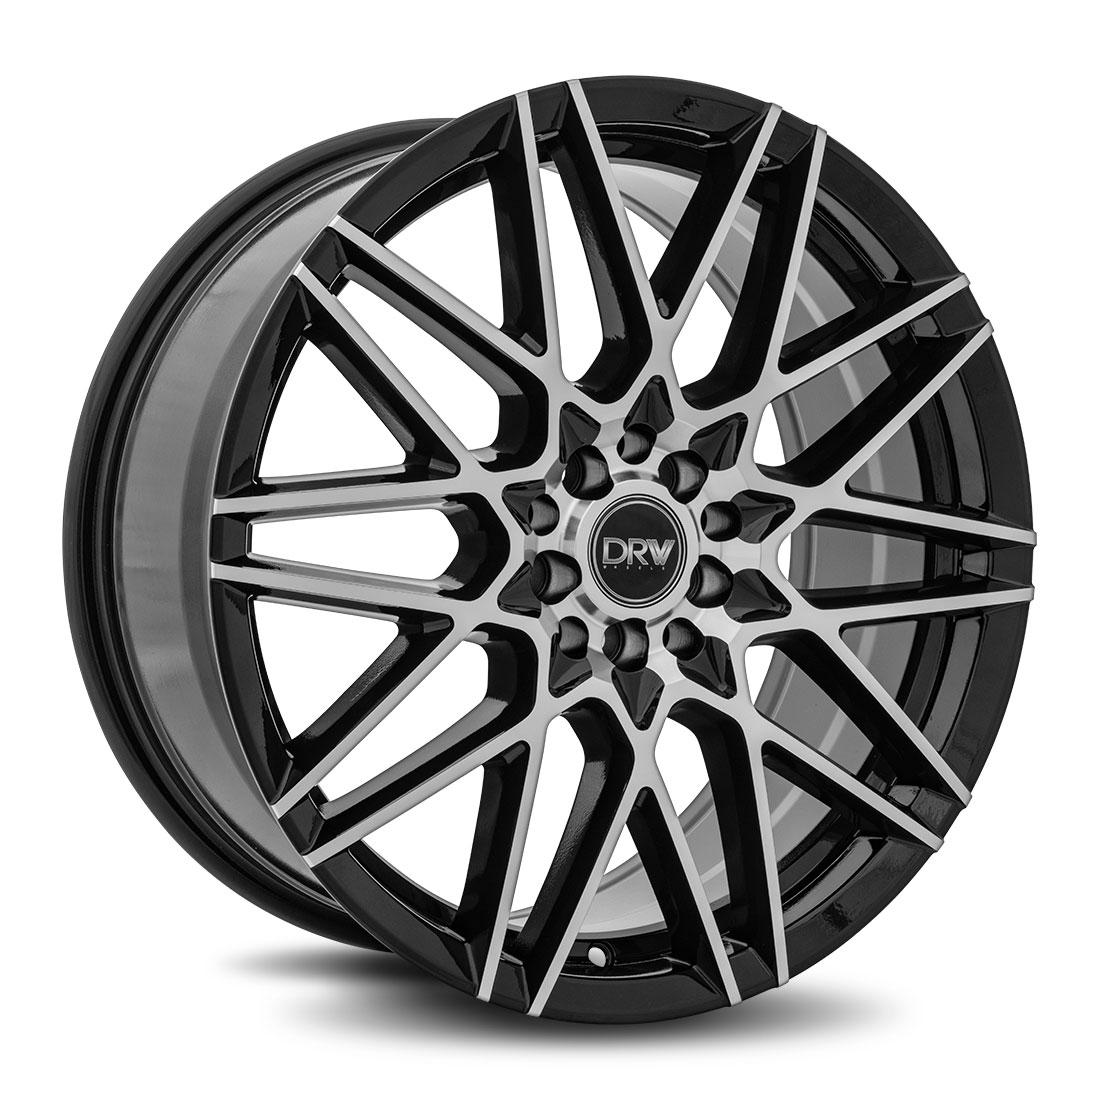 Diablo Racing Wheels DRW D17 - Gloss Black Machine Face Rim